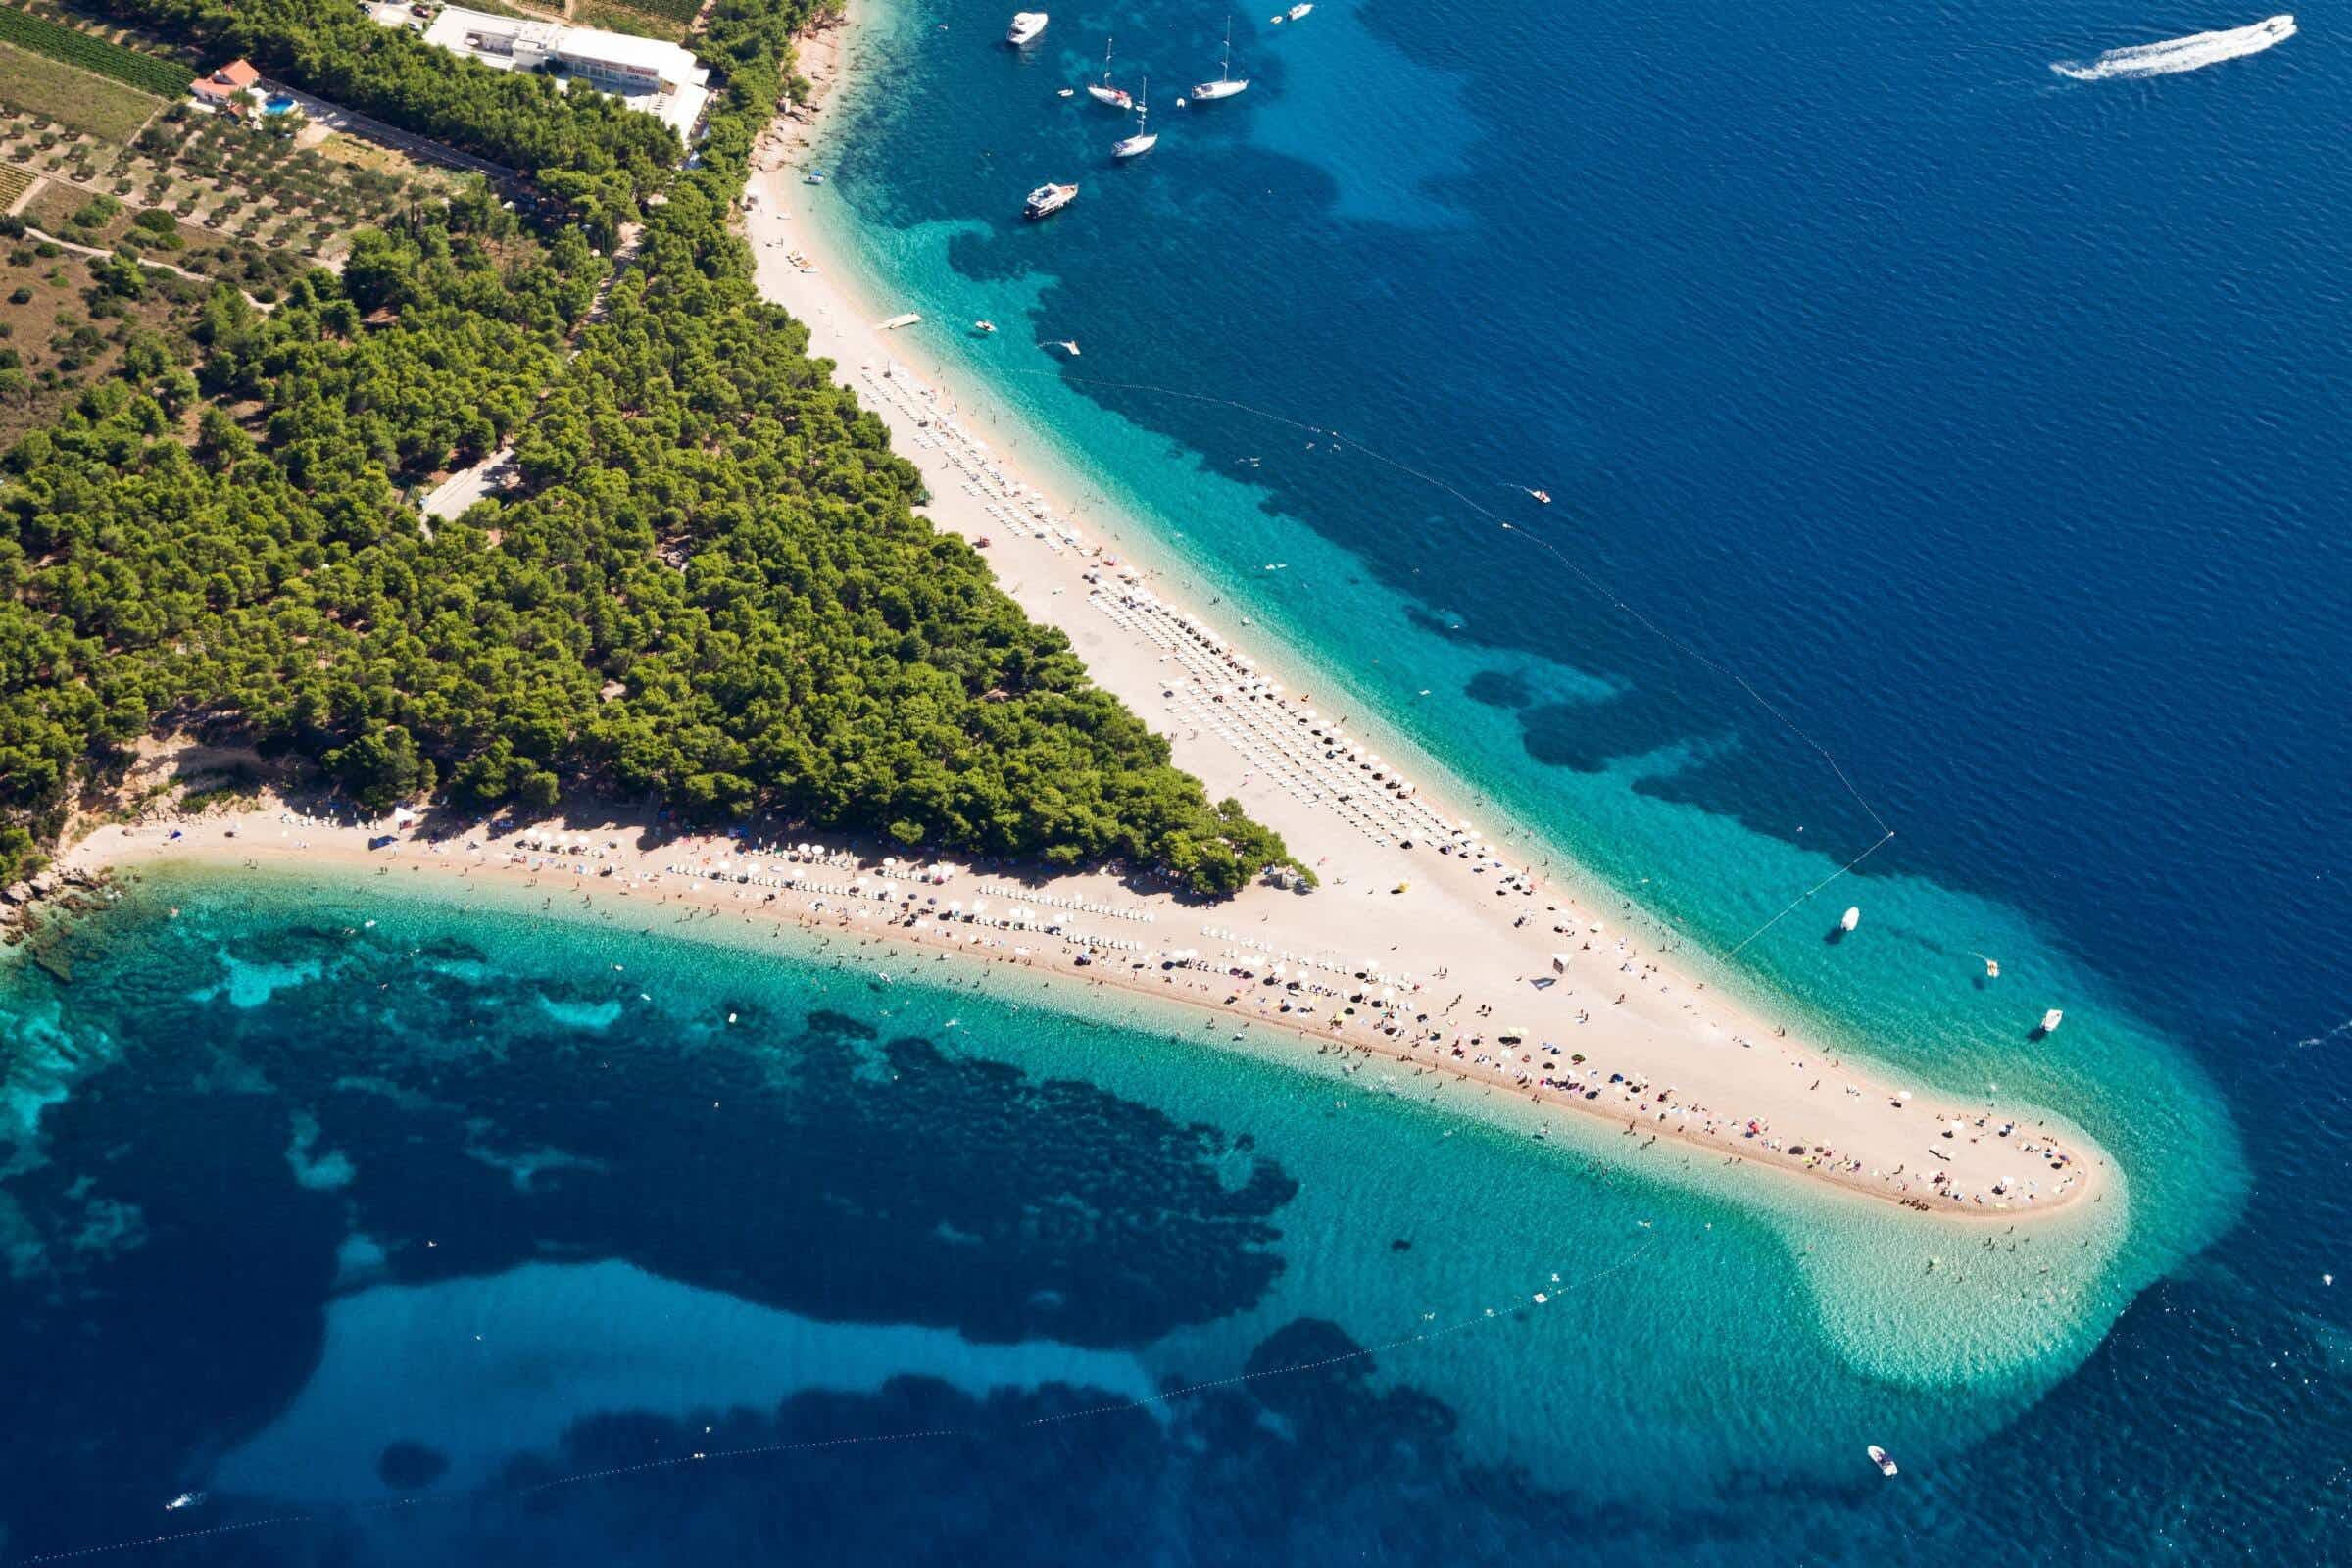 Zlatni Rat in Croatia has been voted the world's best beach (c) Simone Simone/Getty Images